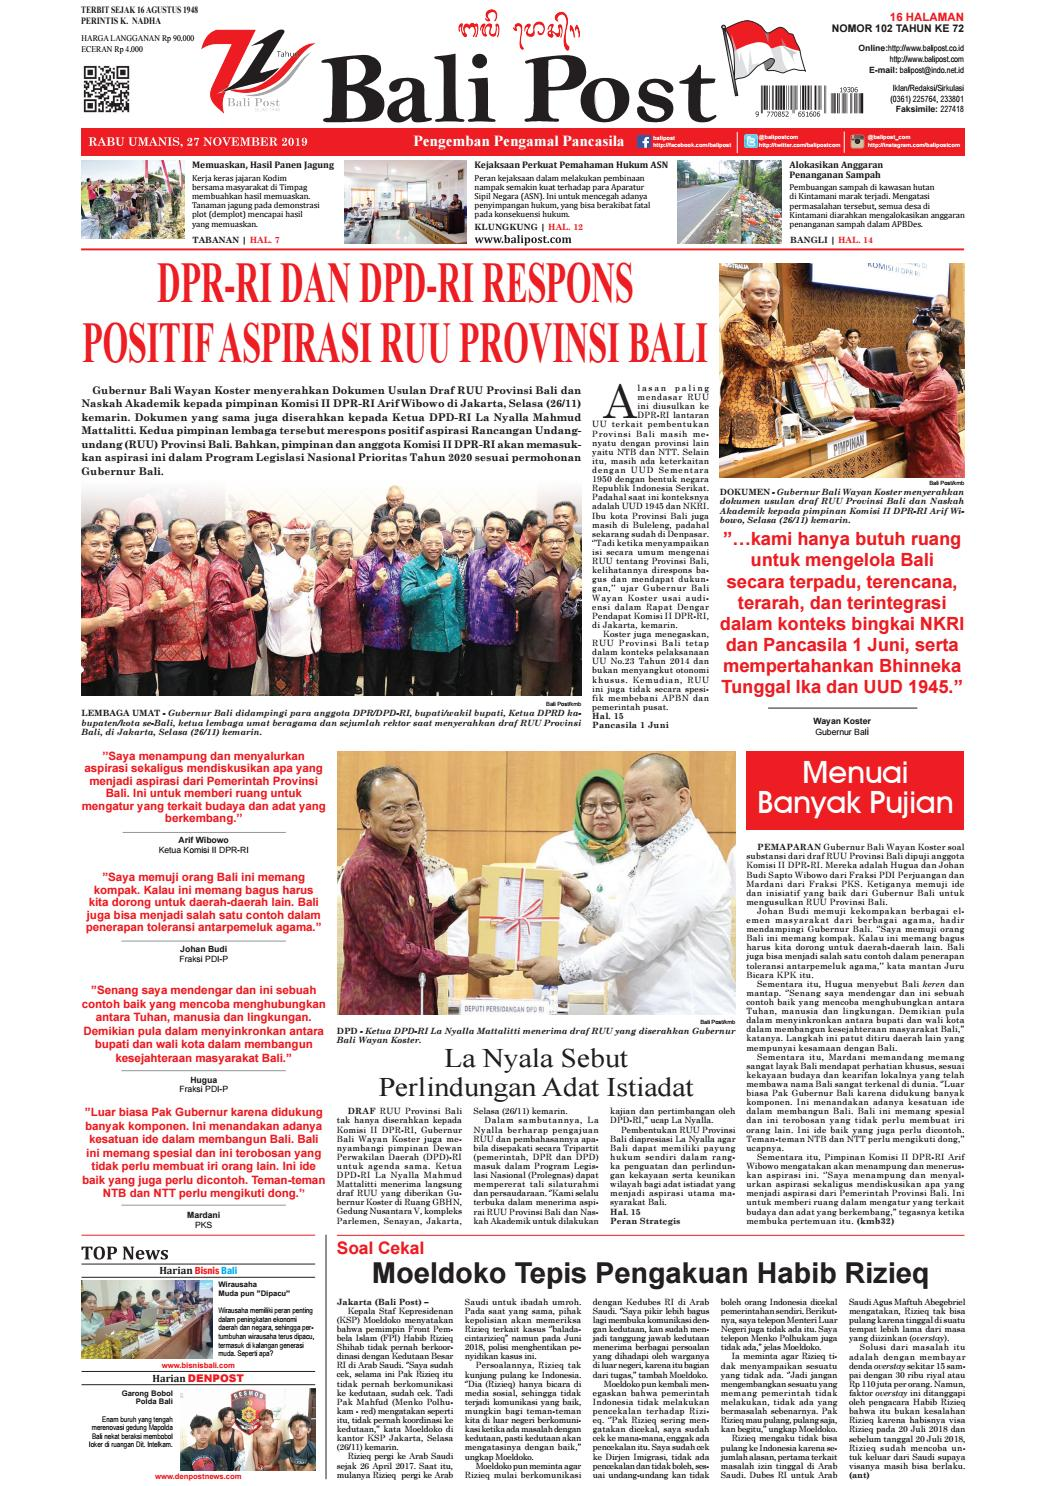 Edisi Rabu 27 Nopember 2019 Balipost Com By E Paper Kmb Issuu